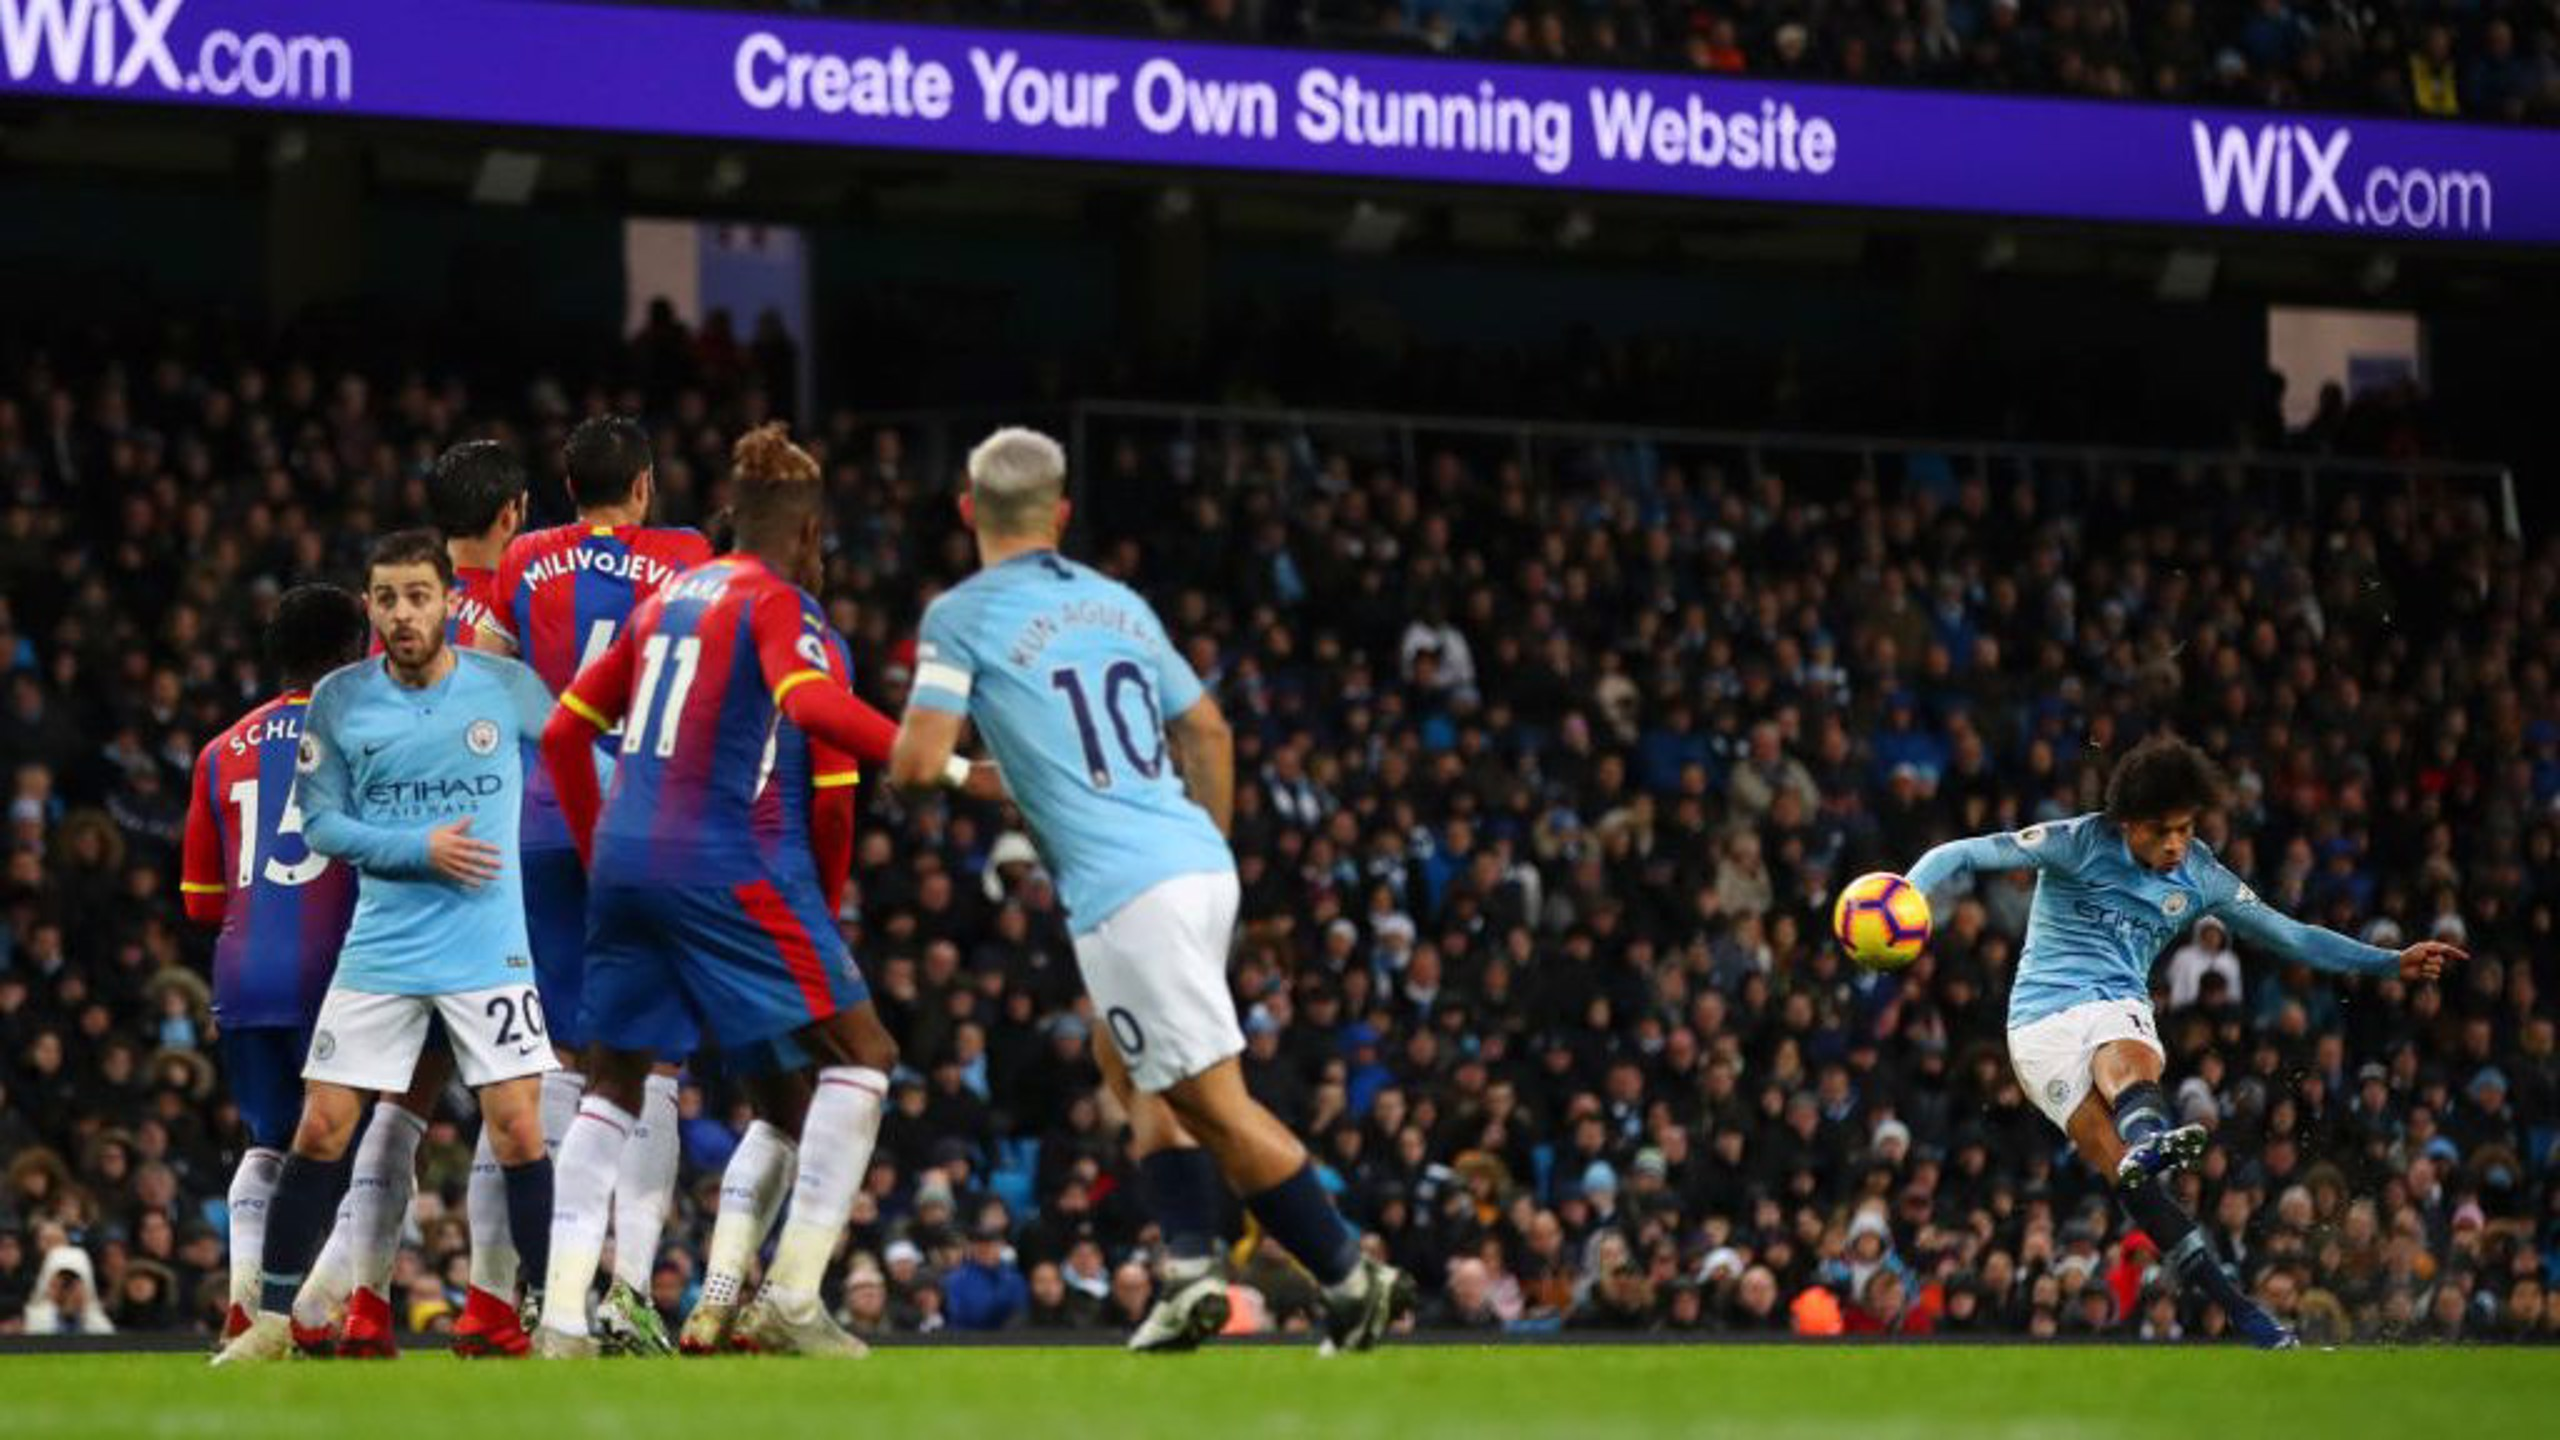 SO CLOSE: Leroy Sane's free kick hits the post